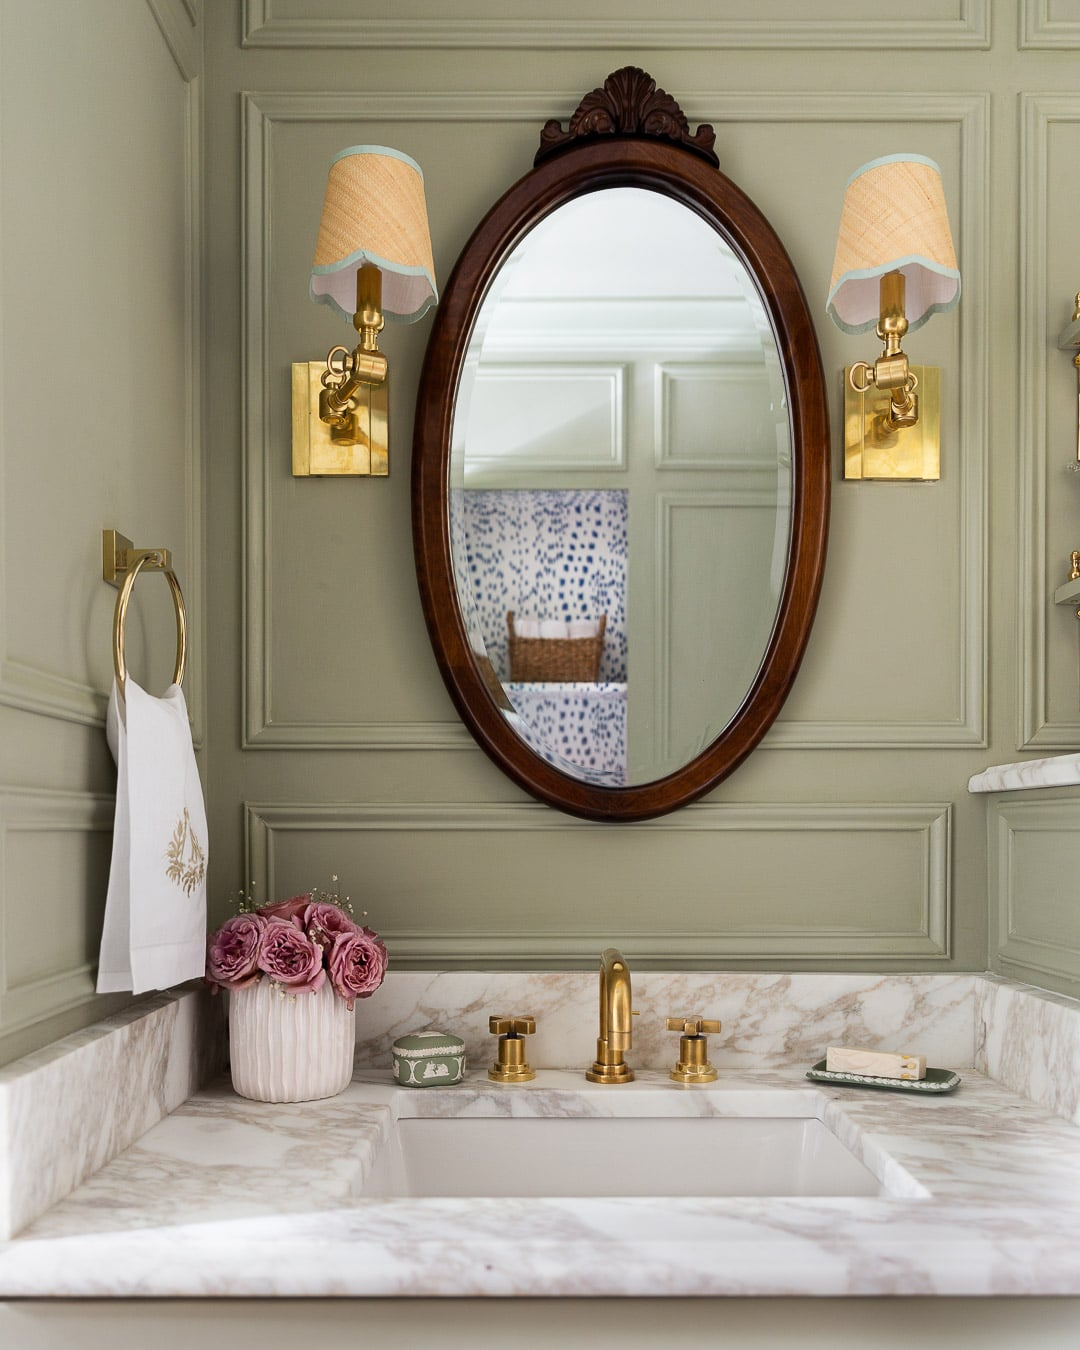 bathroom-sconce-scalloped-shades-modern-traditiona-bathroom-better-homes-gardens